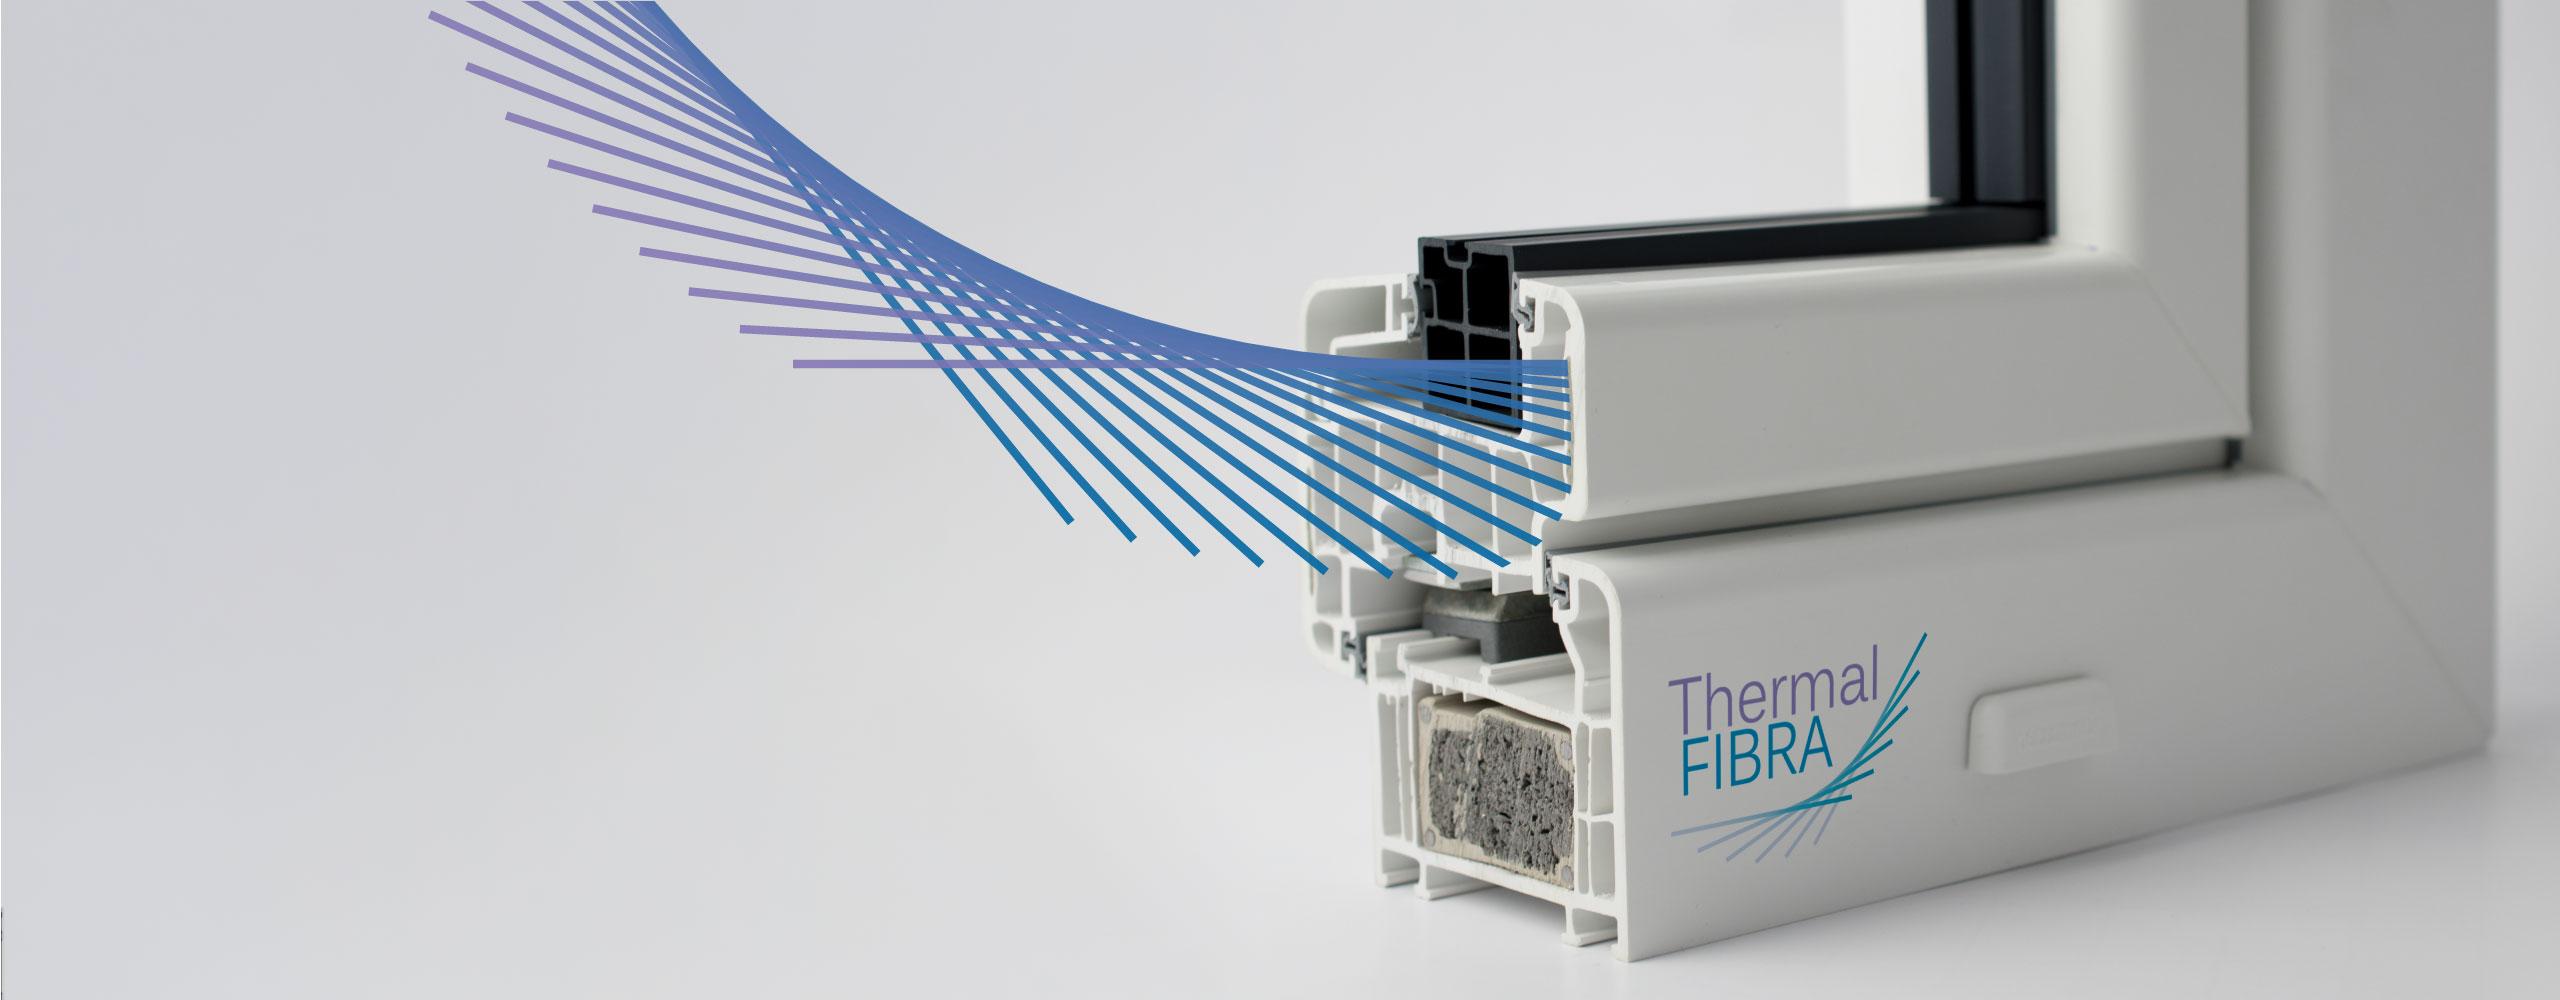 thermalfibra slider